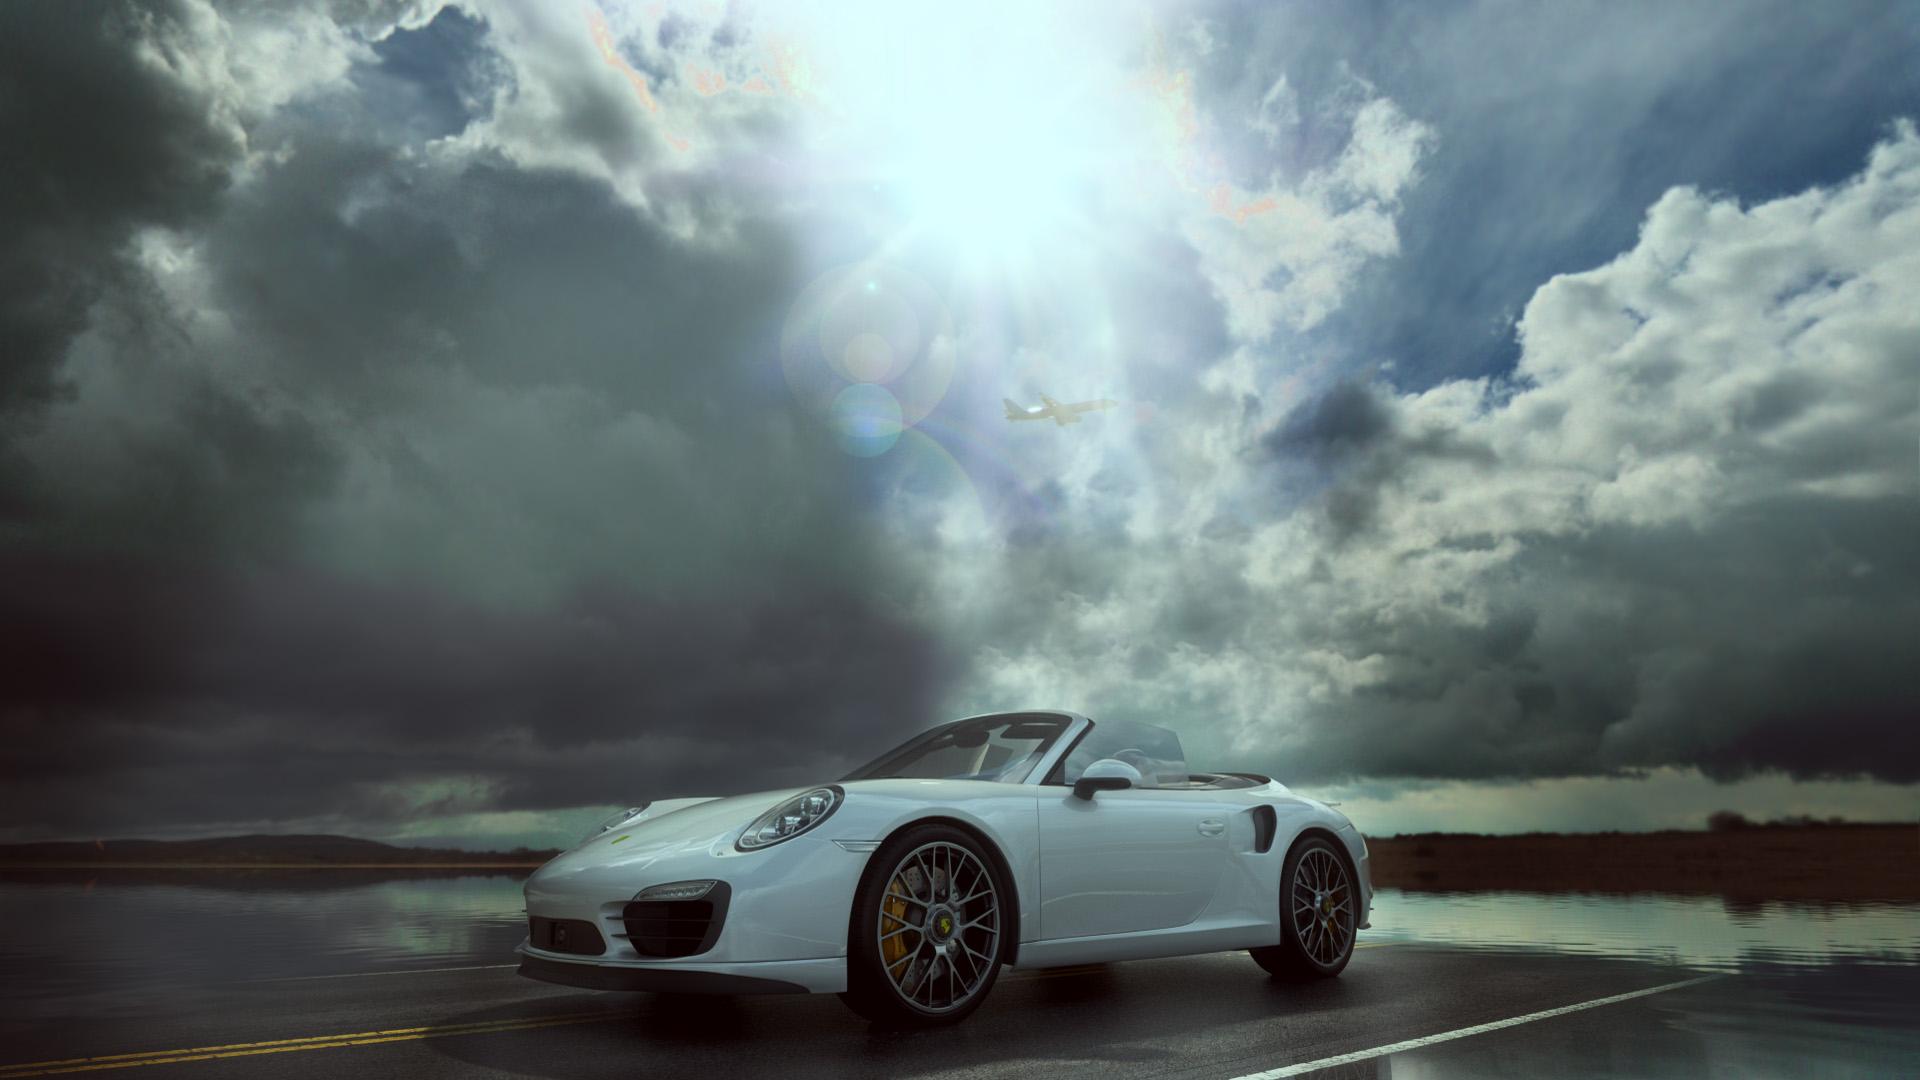 Porsche Turbo Cabriolet 2014 after rain scene 3d art